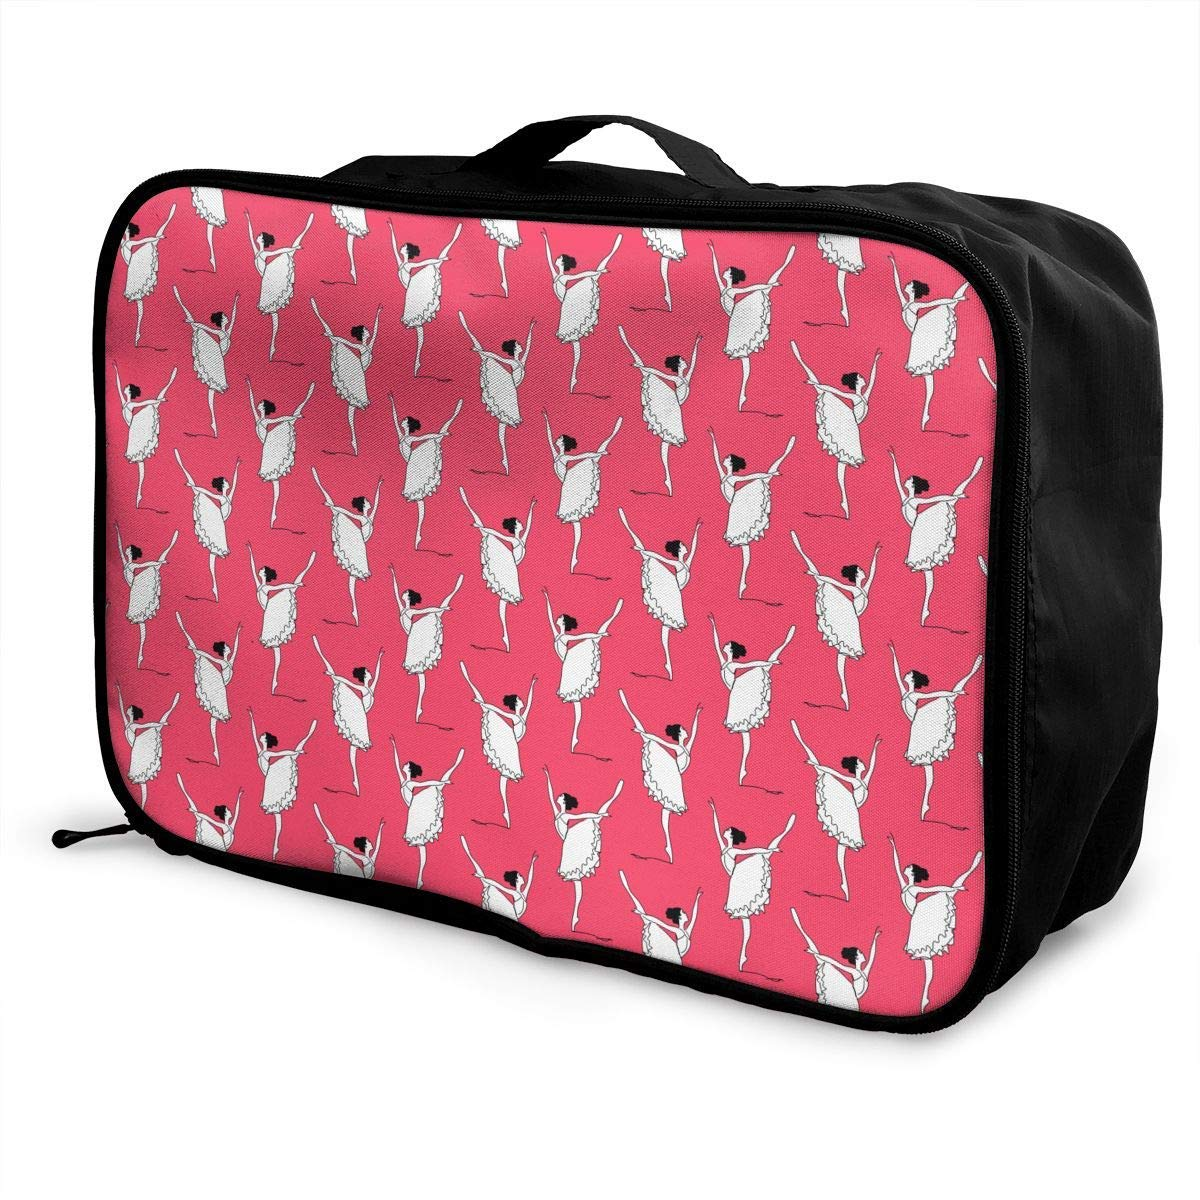 Lightweight Large Capacity Portable Luggage Bag Ballet Dancer Travel Duffel Bag Backpack